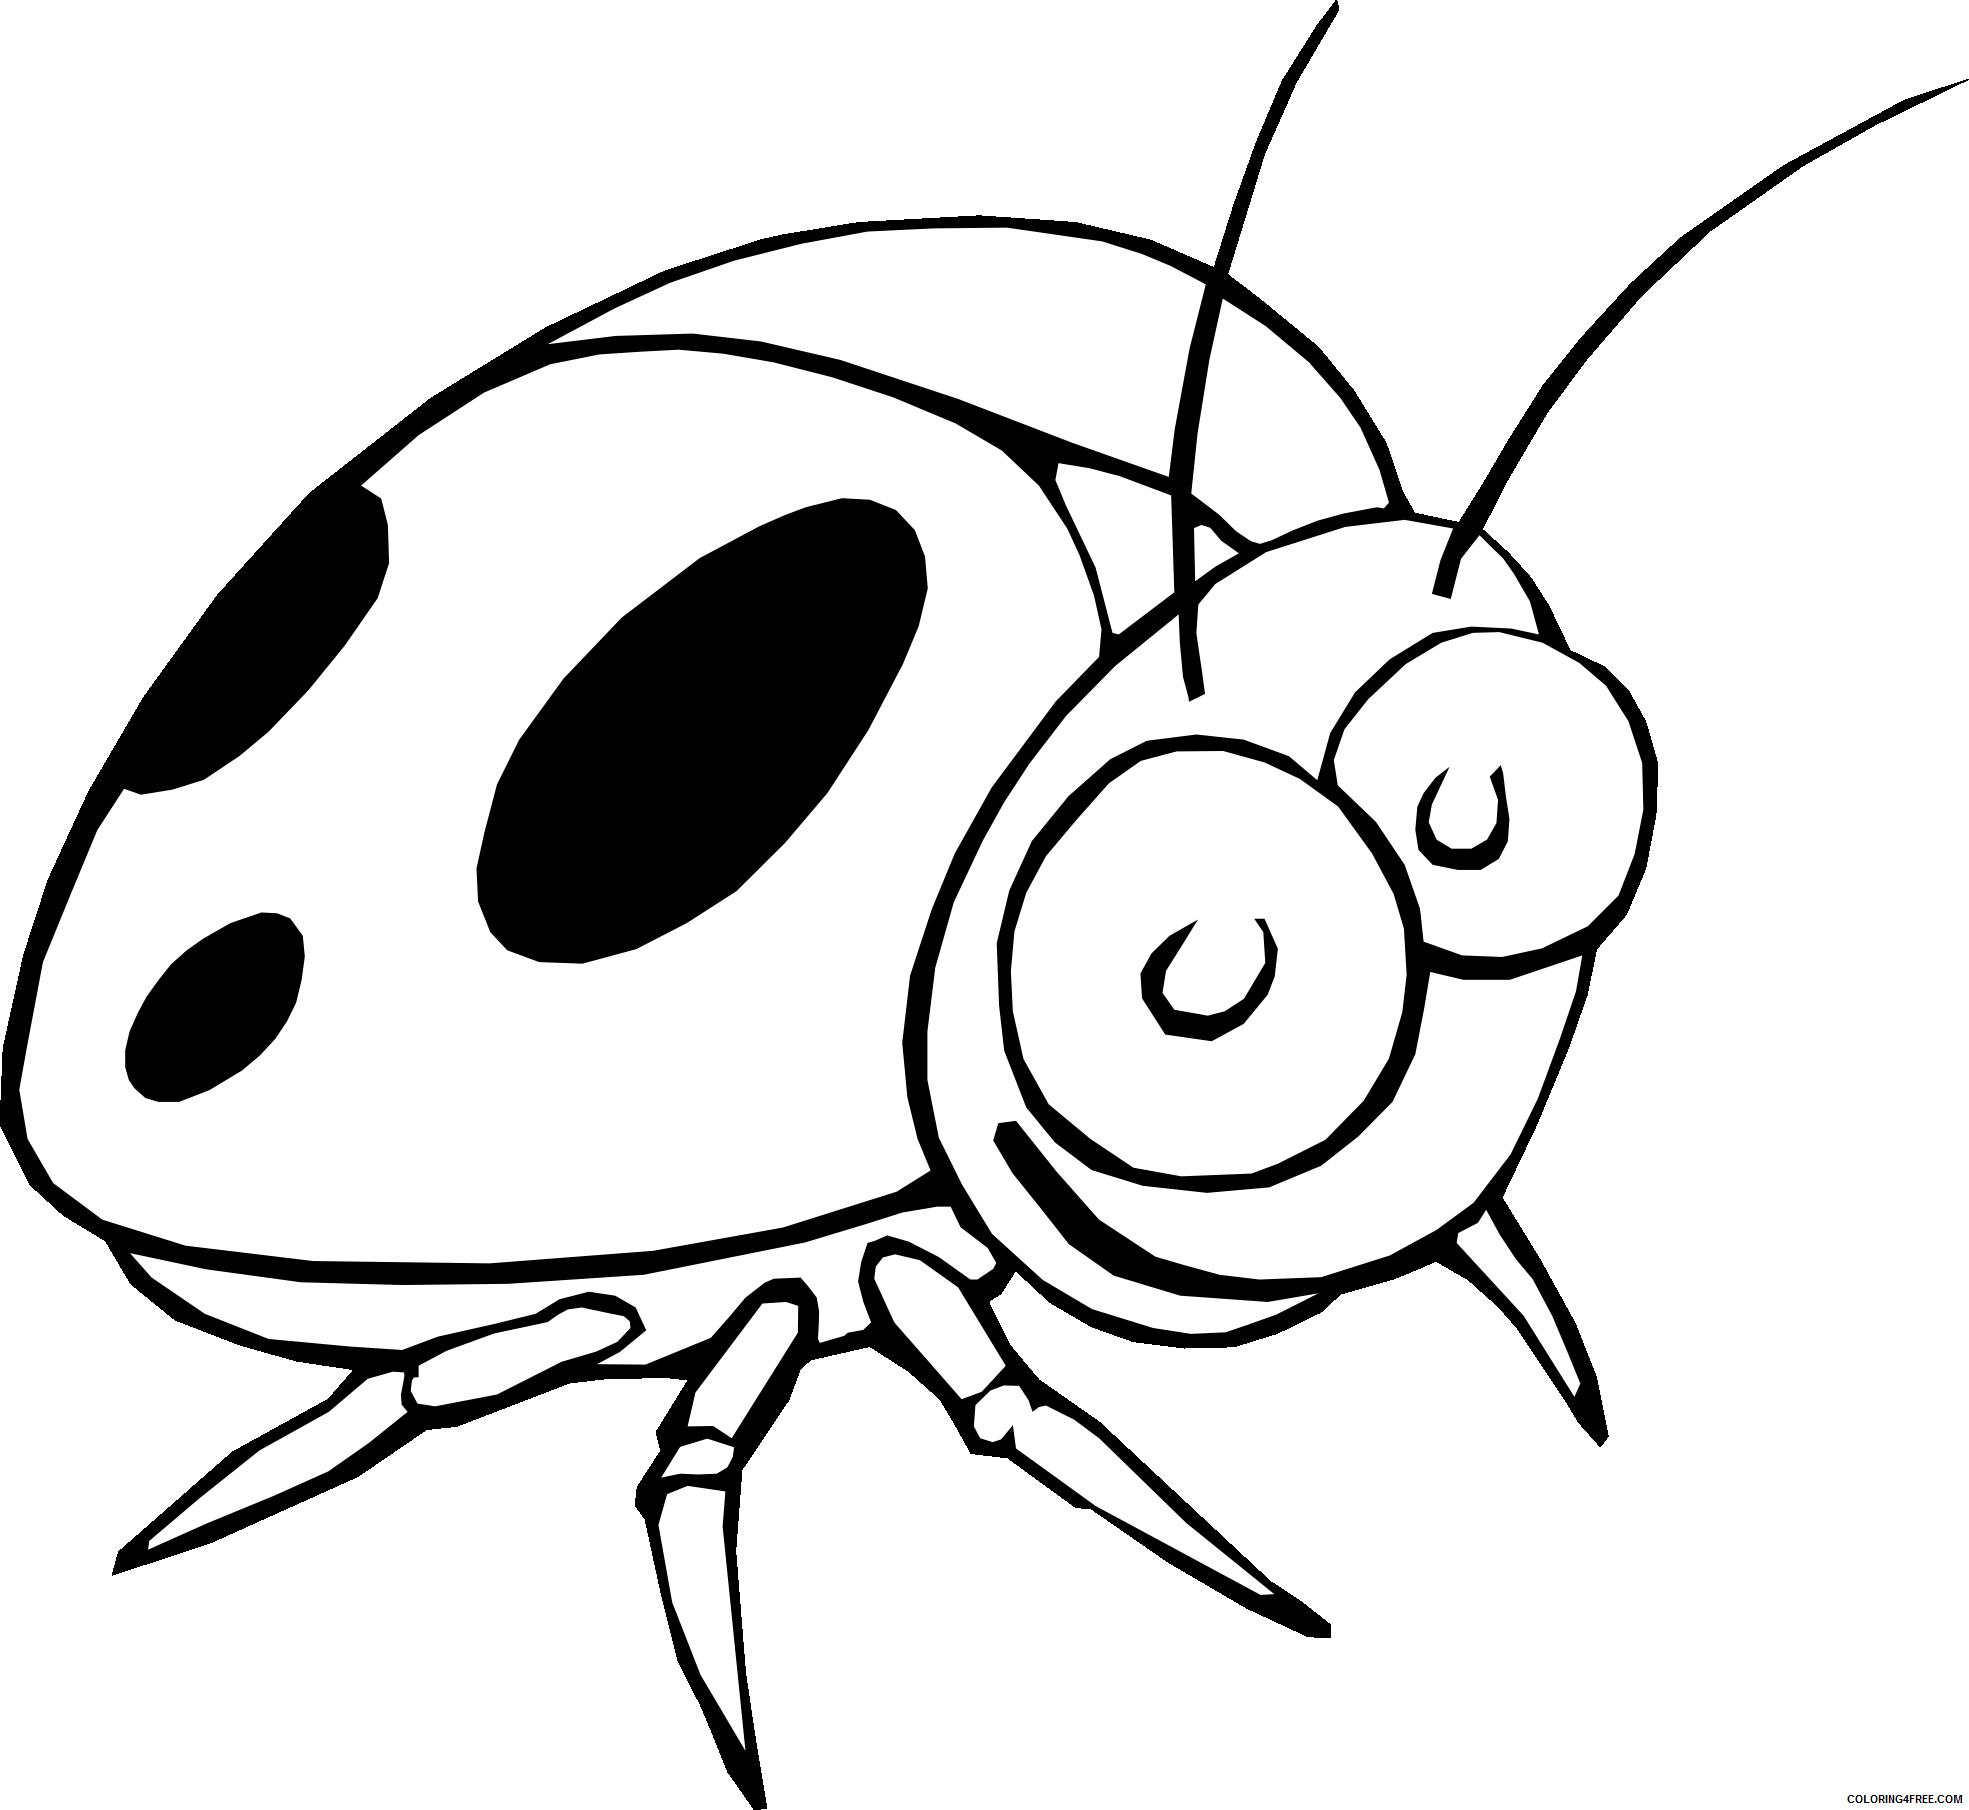 Ladybug Outline Coloring Pages ladybug outline bfree Printable Coloring4free